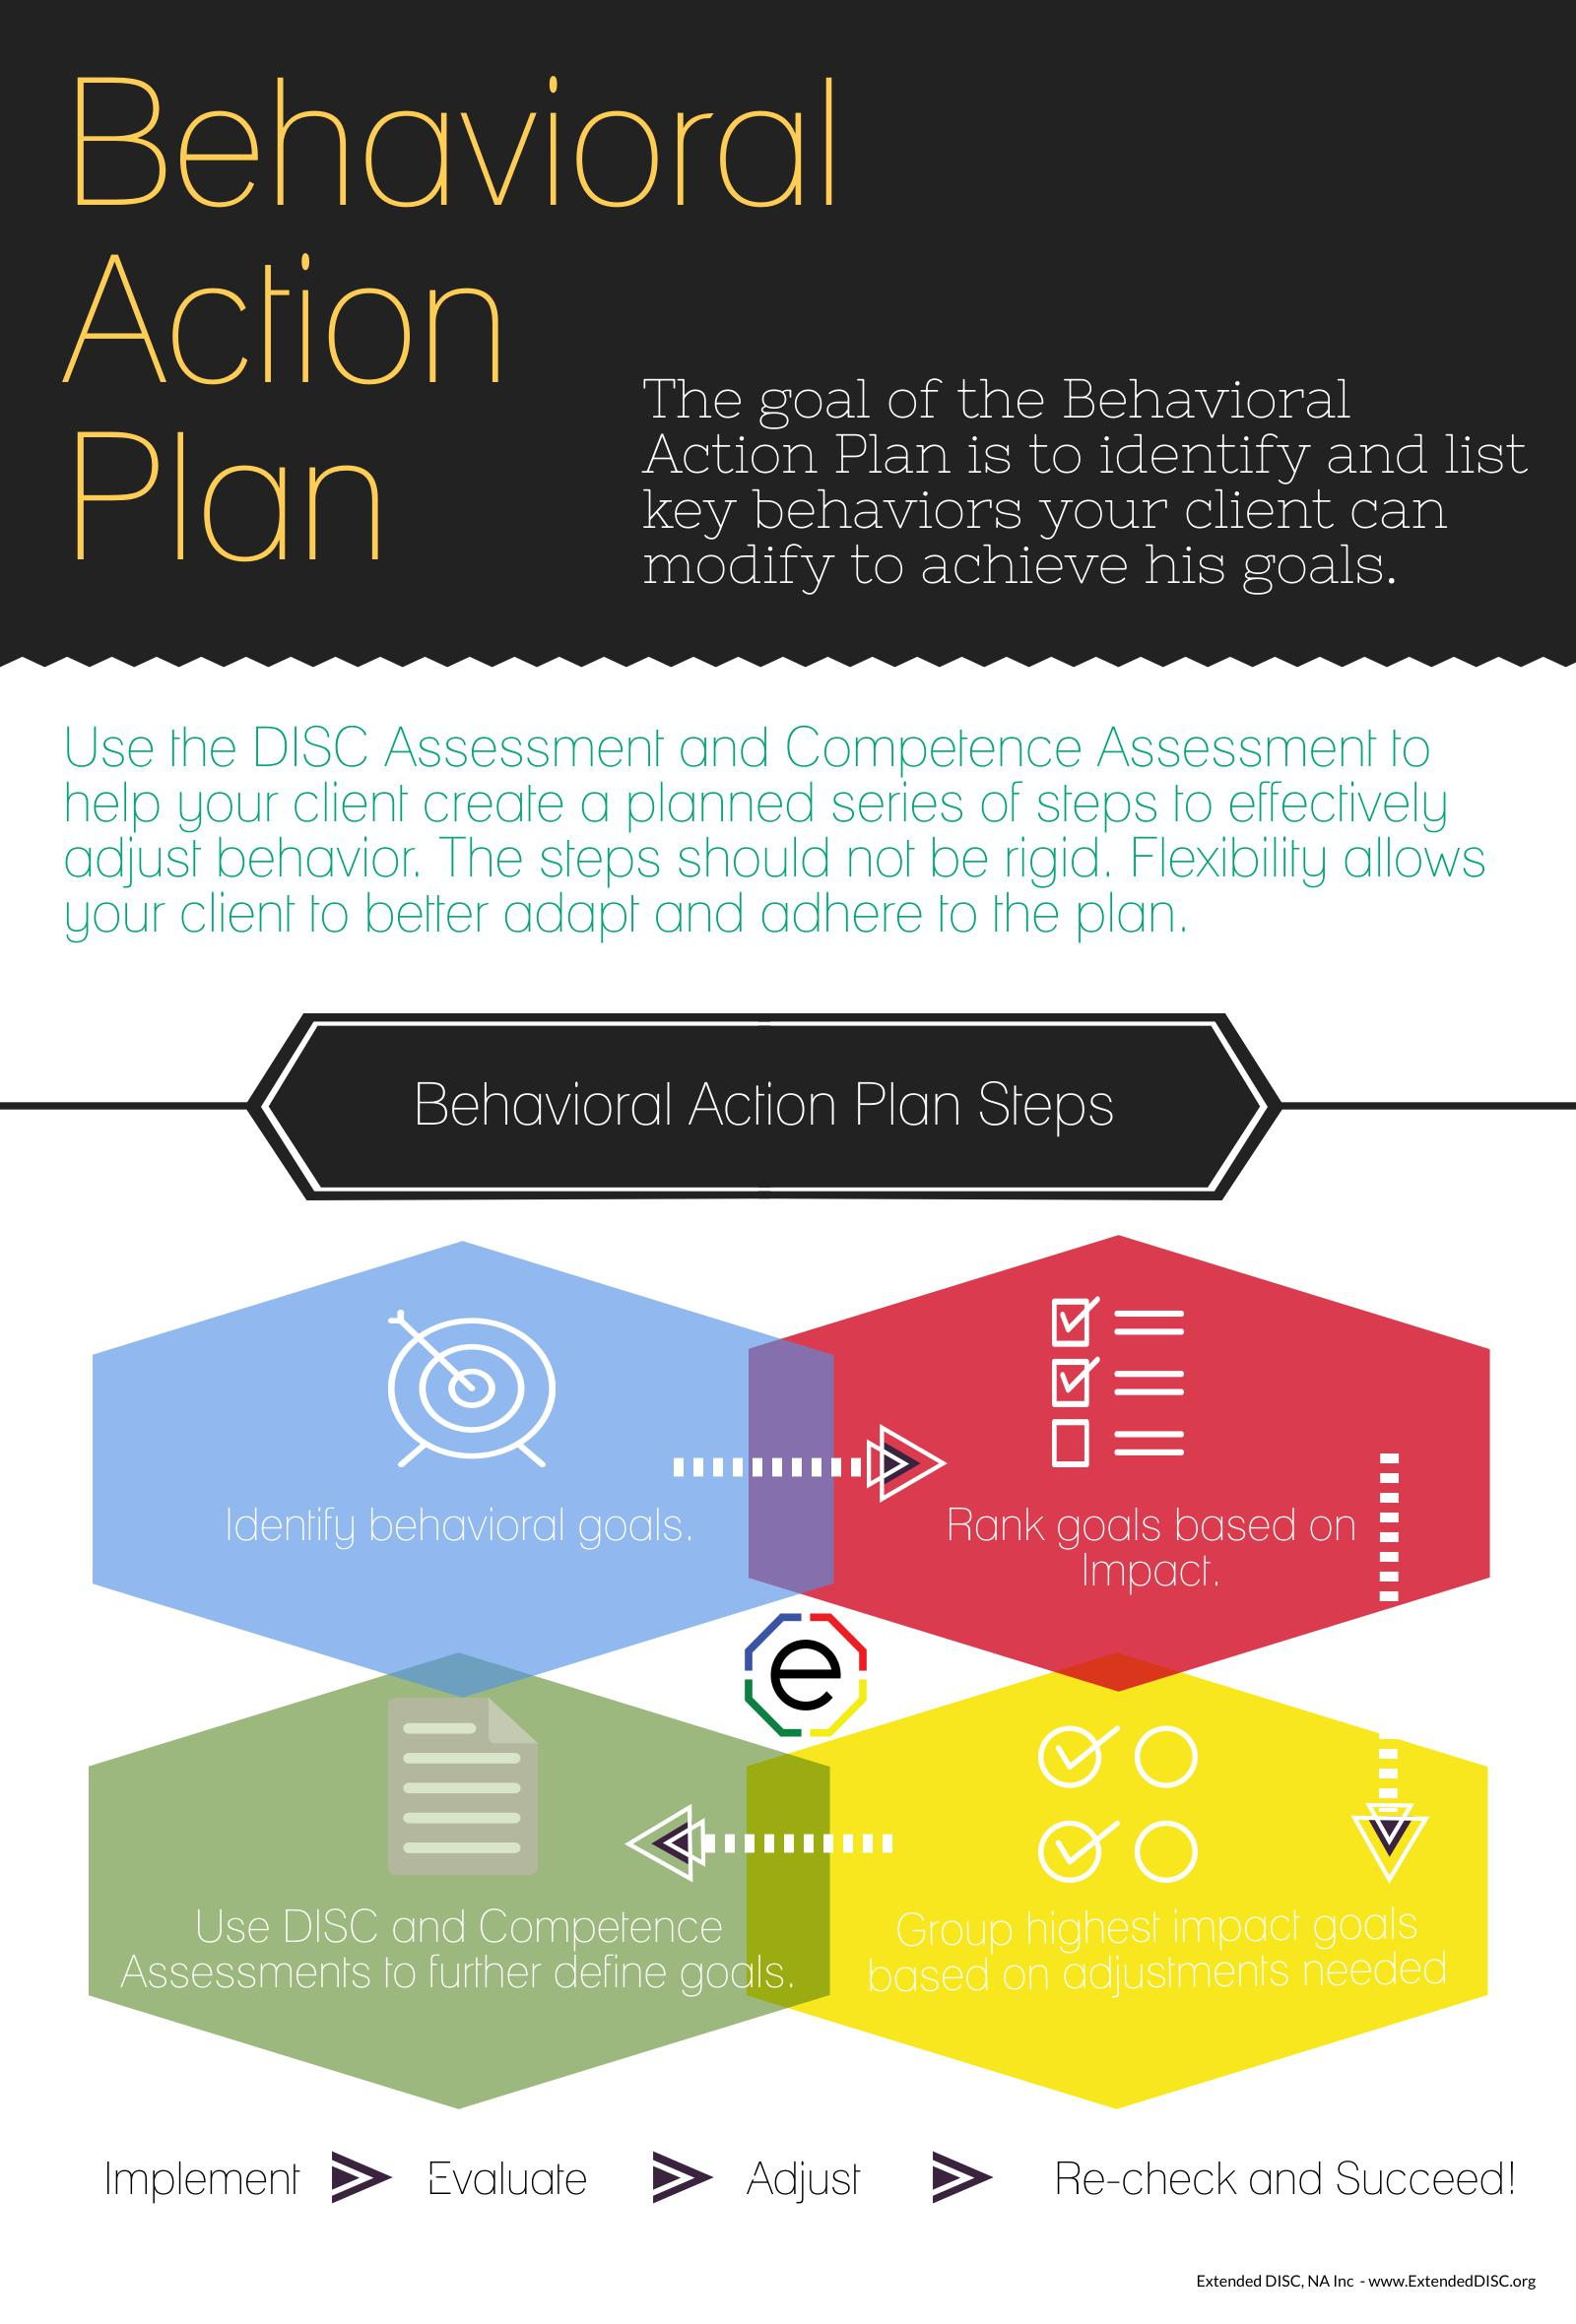 Behavioral Action Plan Steps Infographic